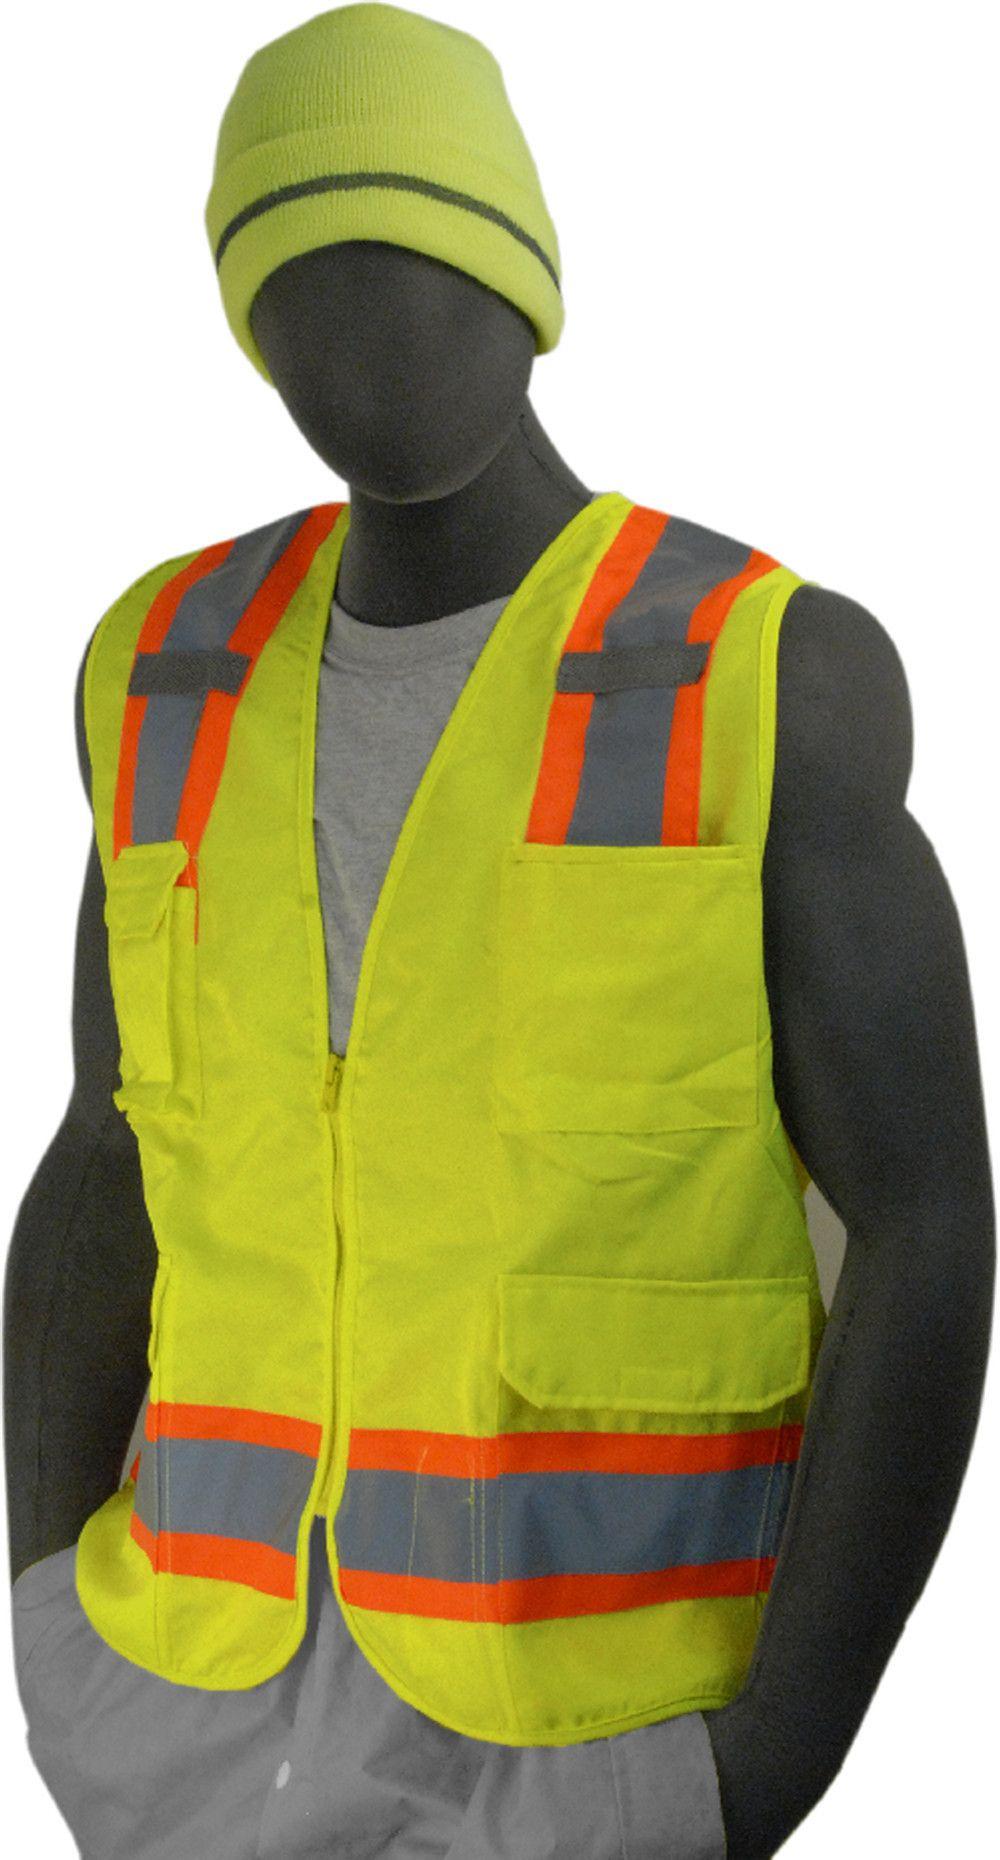 Safety Vest Majestic 753223 CL2 Hi Vis Surveyor Vest